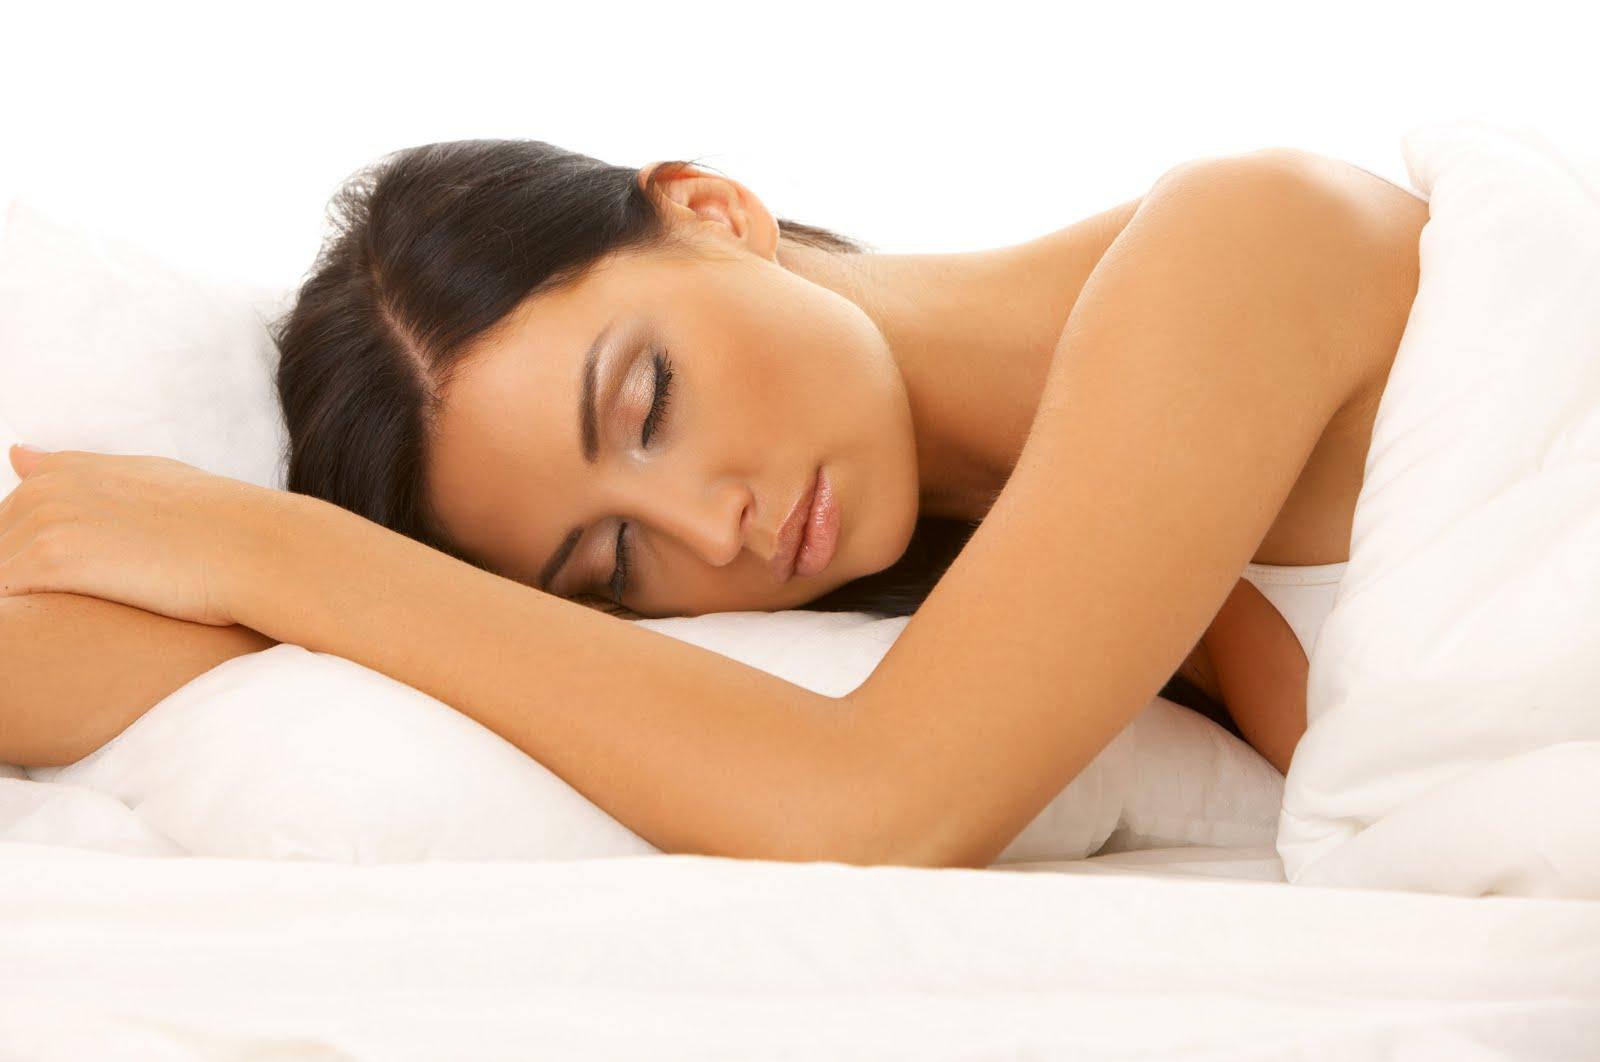 Sleeping-Makes-a-Woman-More-Beautiful.jpg